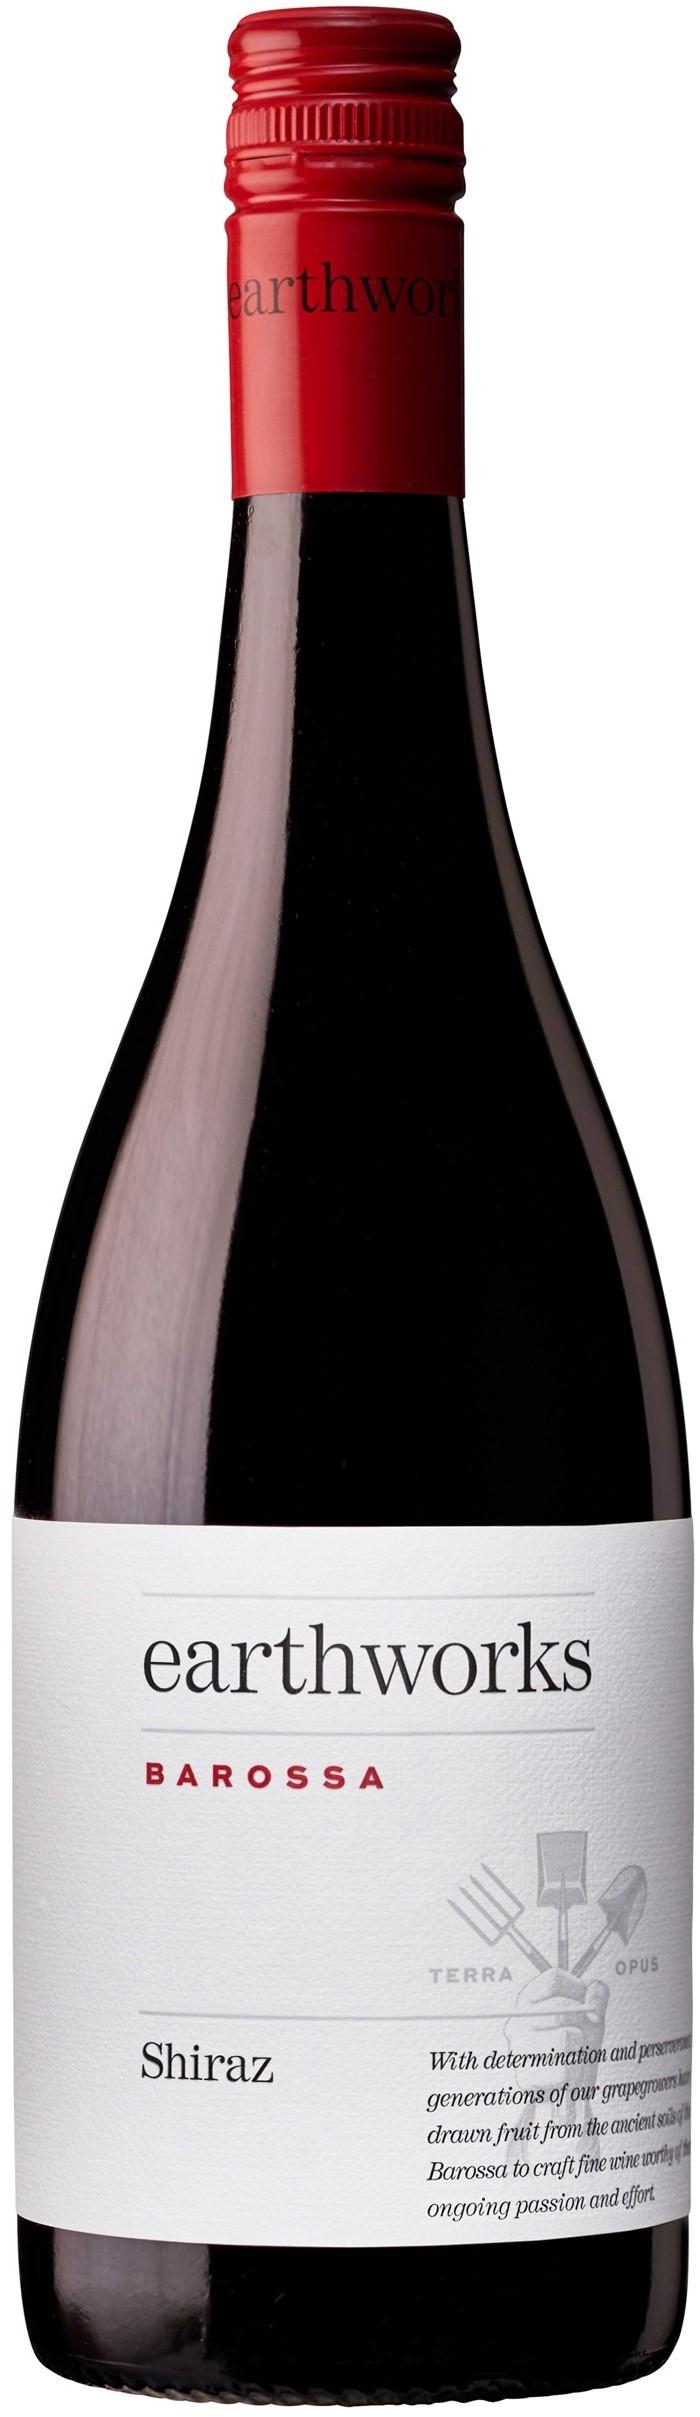 Caudalia wine Box Febrero 2020 Shiraz Australia Earthworks